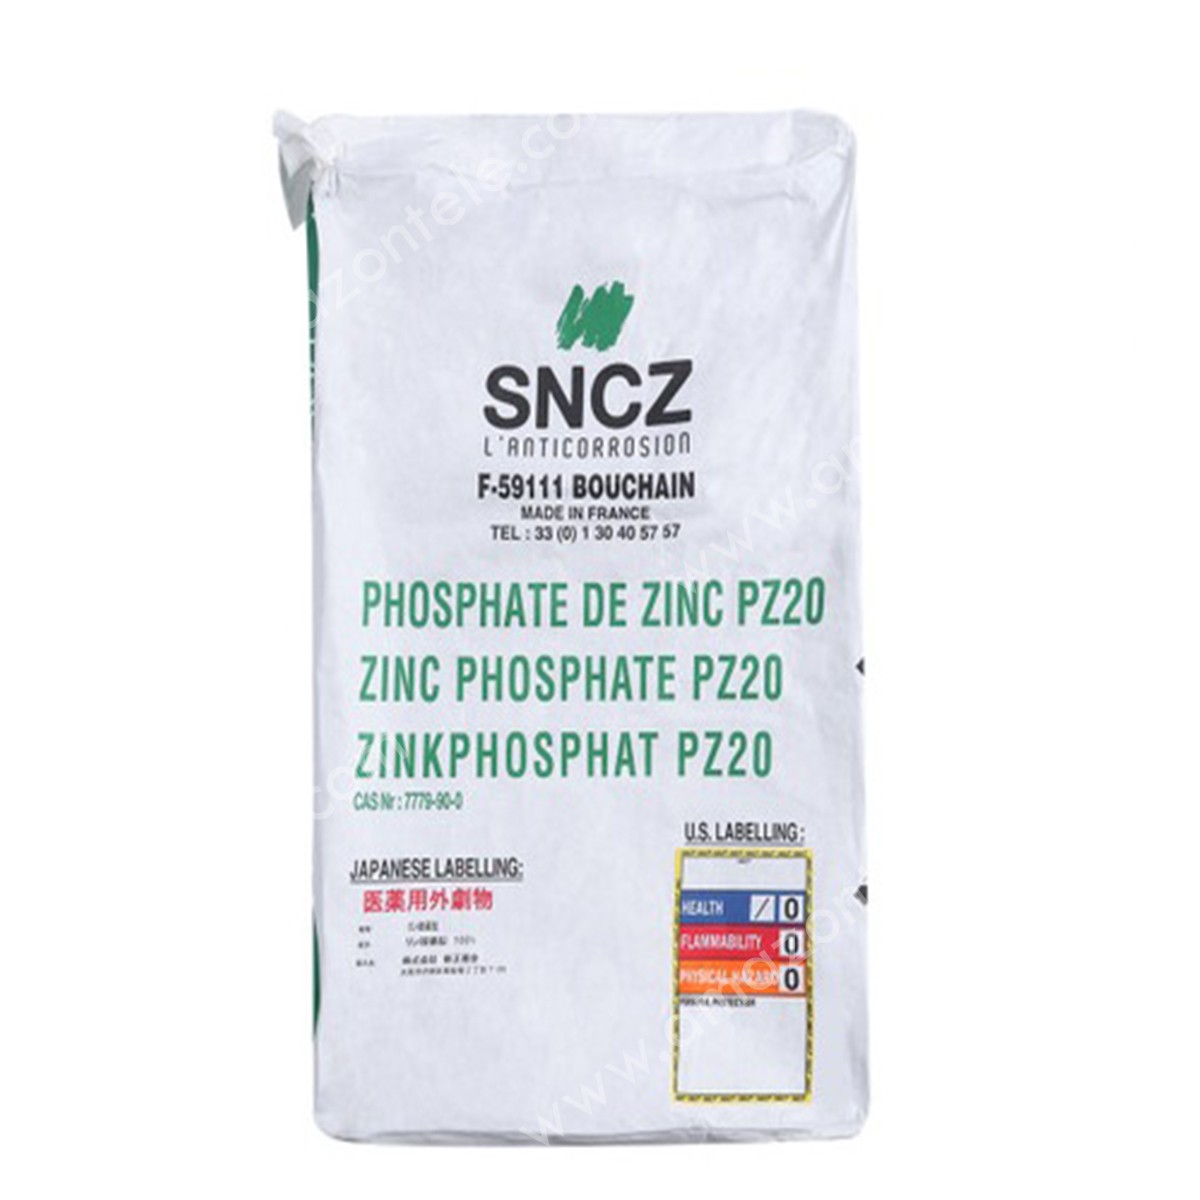 پیگمنت ضد خوردگی زینک فسفات - Zinc Phosphate